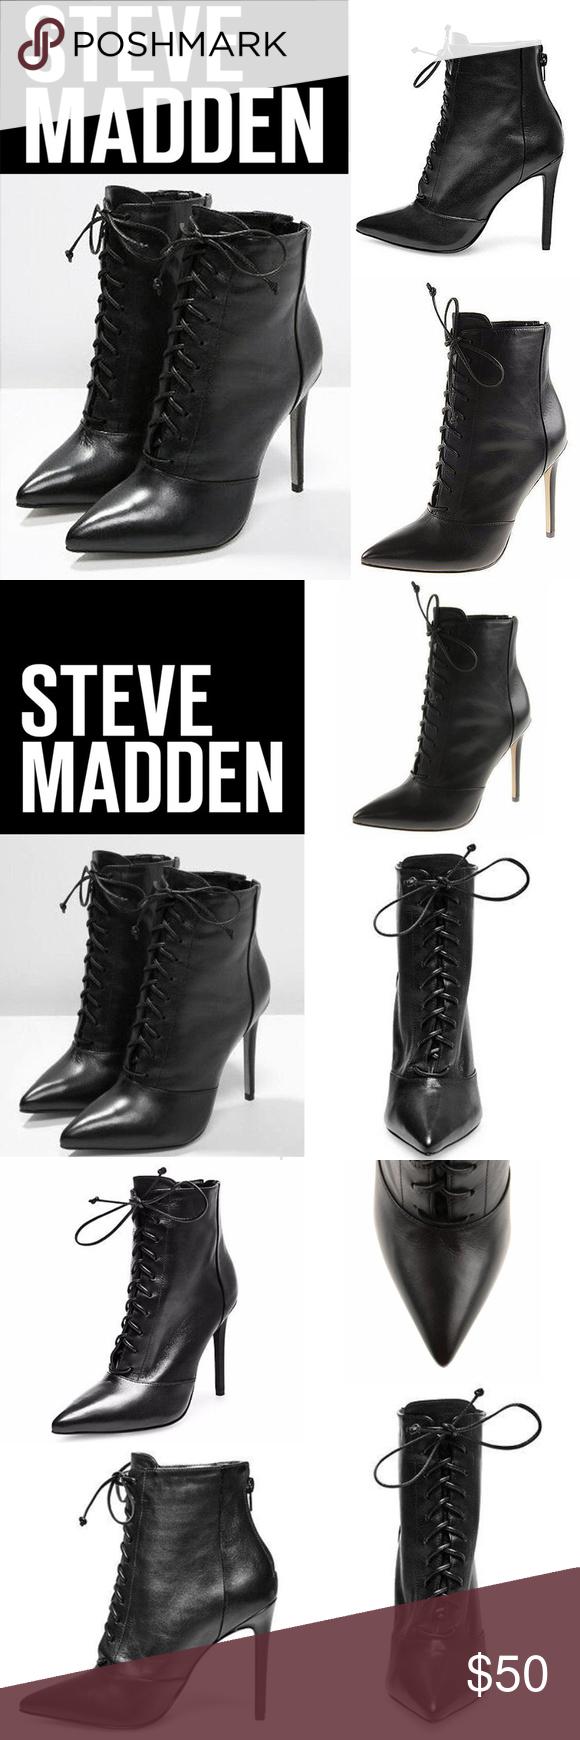 5e3103d6499 Steve Madden Black Leather Lace-up Heel Bootie Exquisite Steve Madden  PAULINEE